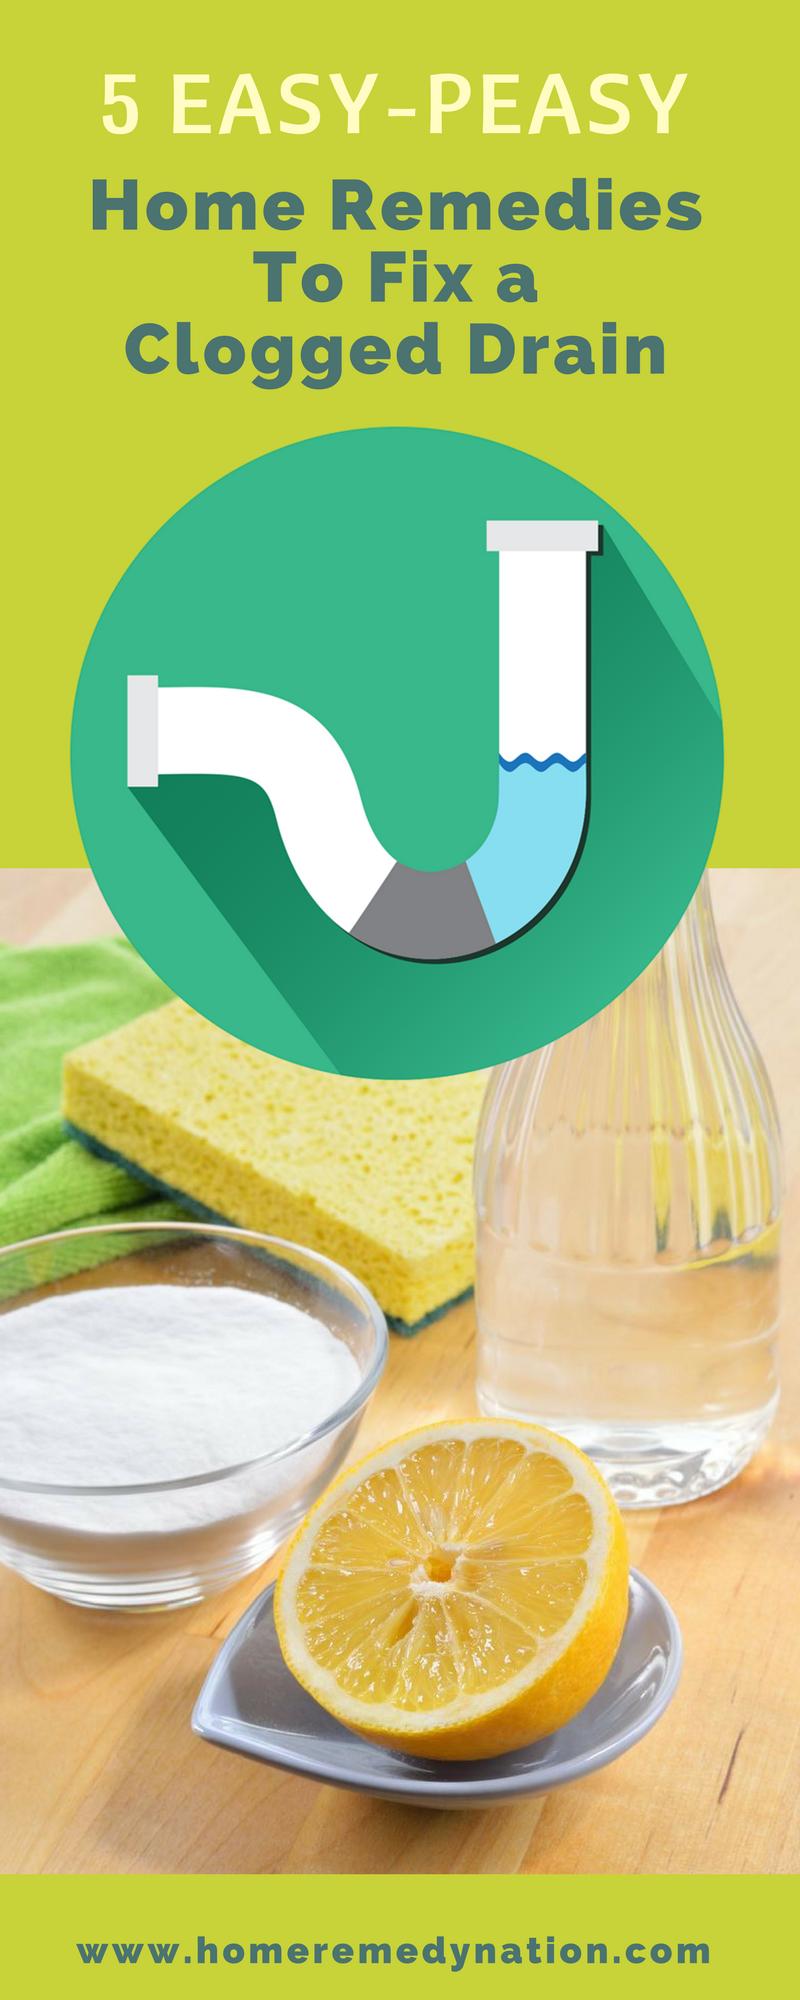 5 Helpful Home Remedies To Fix A Clogged Drain Do It At Home Clogged Drain Home Remedies Remedies